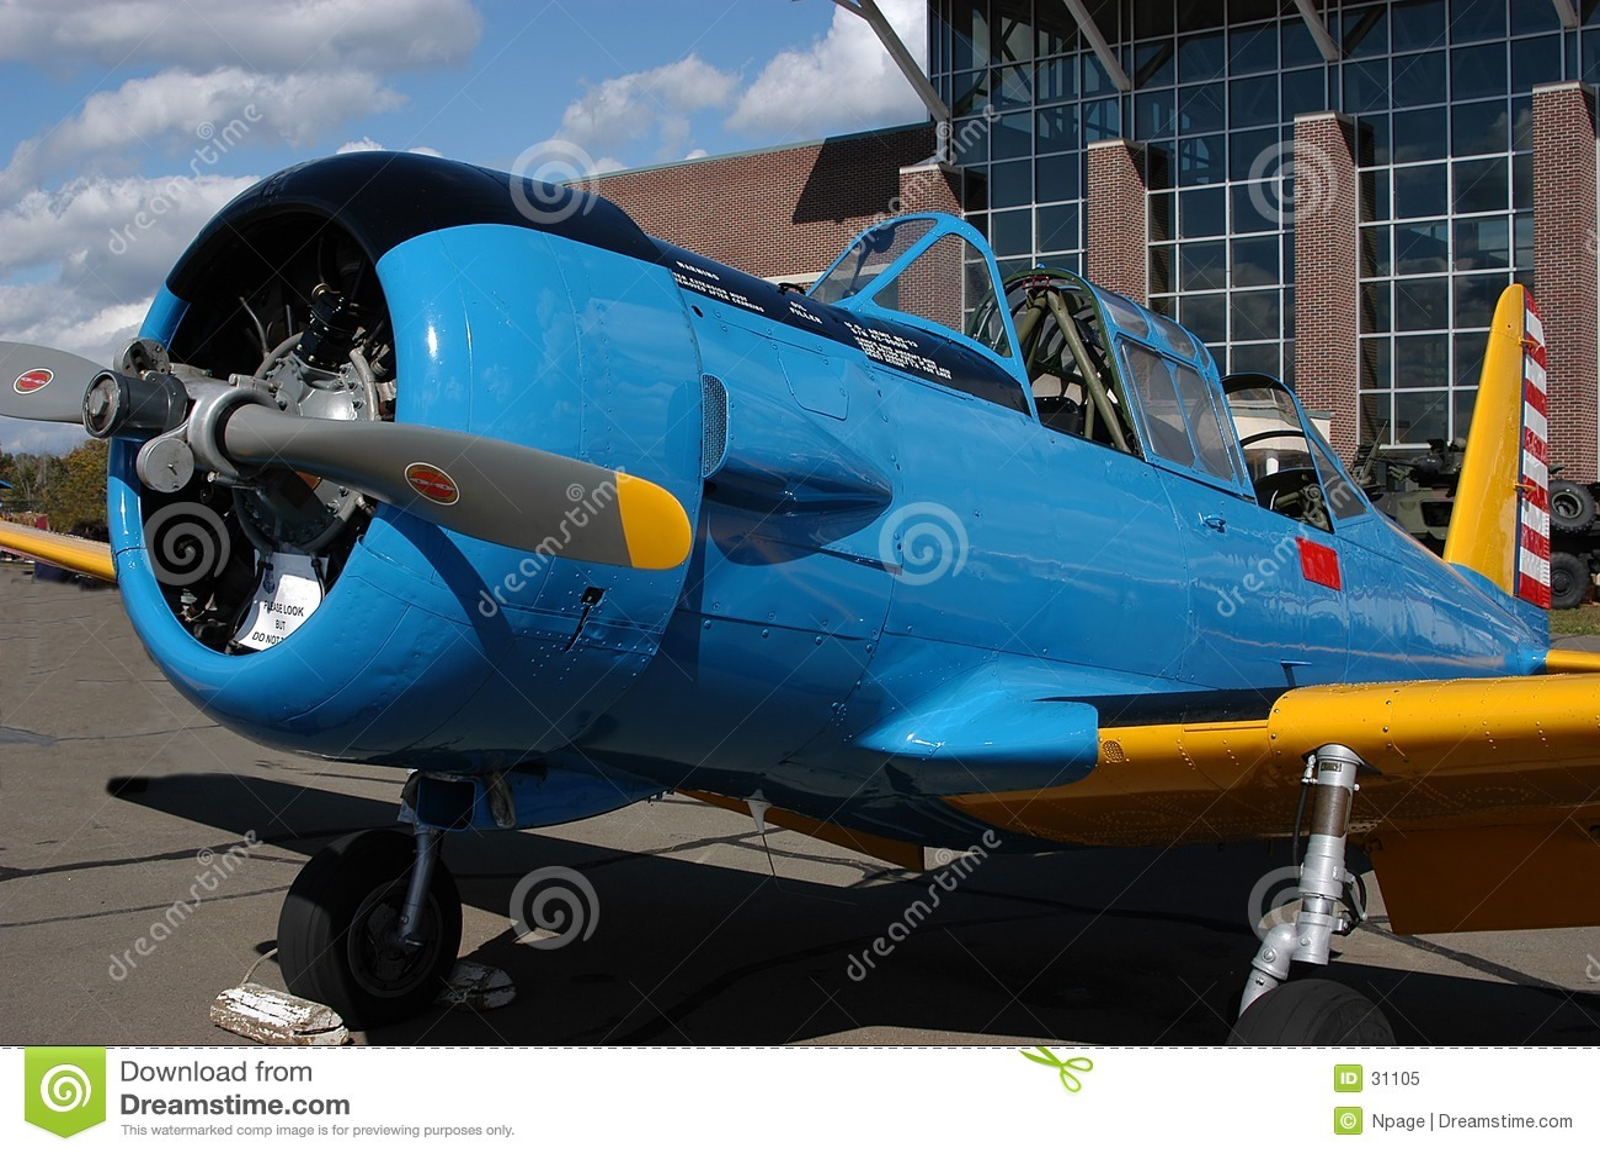 Antique Airplane II